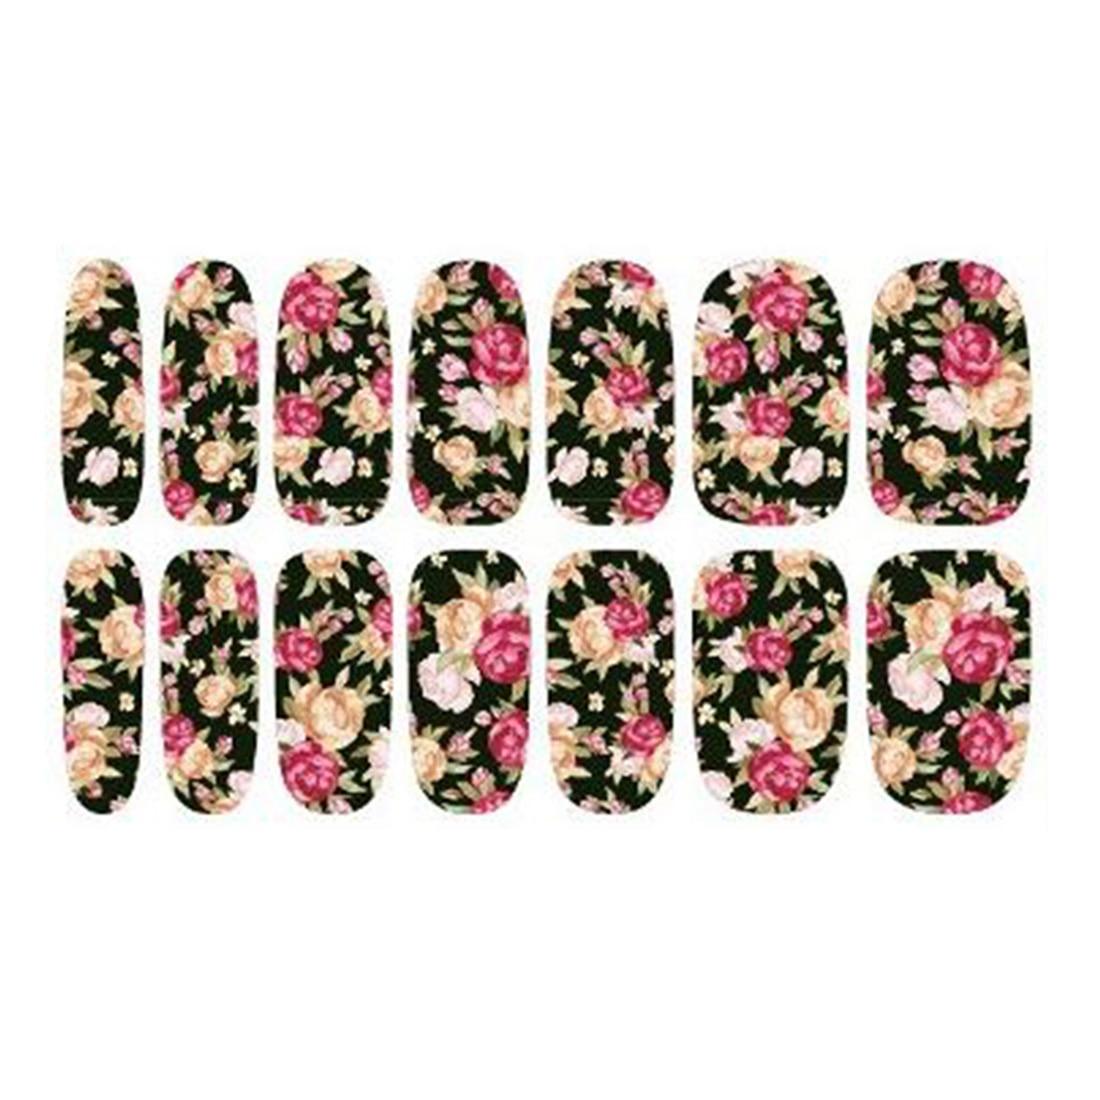 Nette Wassertransfer Nails art Sticker Rose Blumen Design Nagel ...